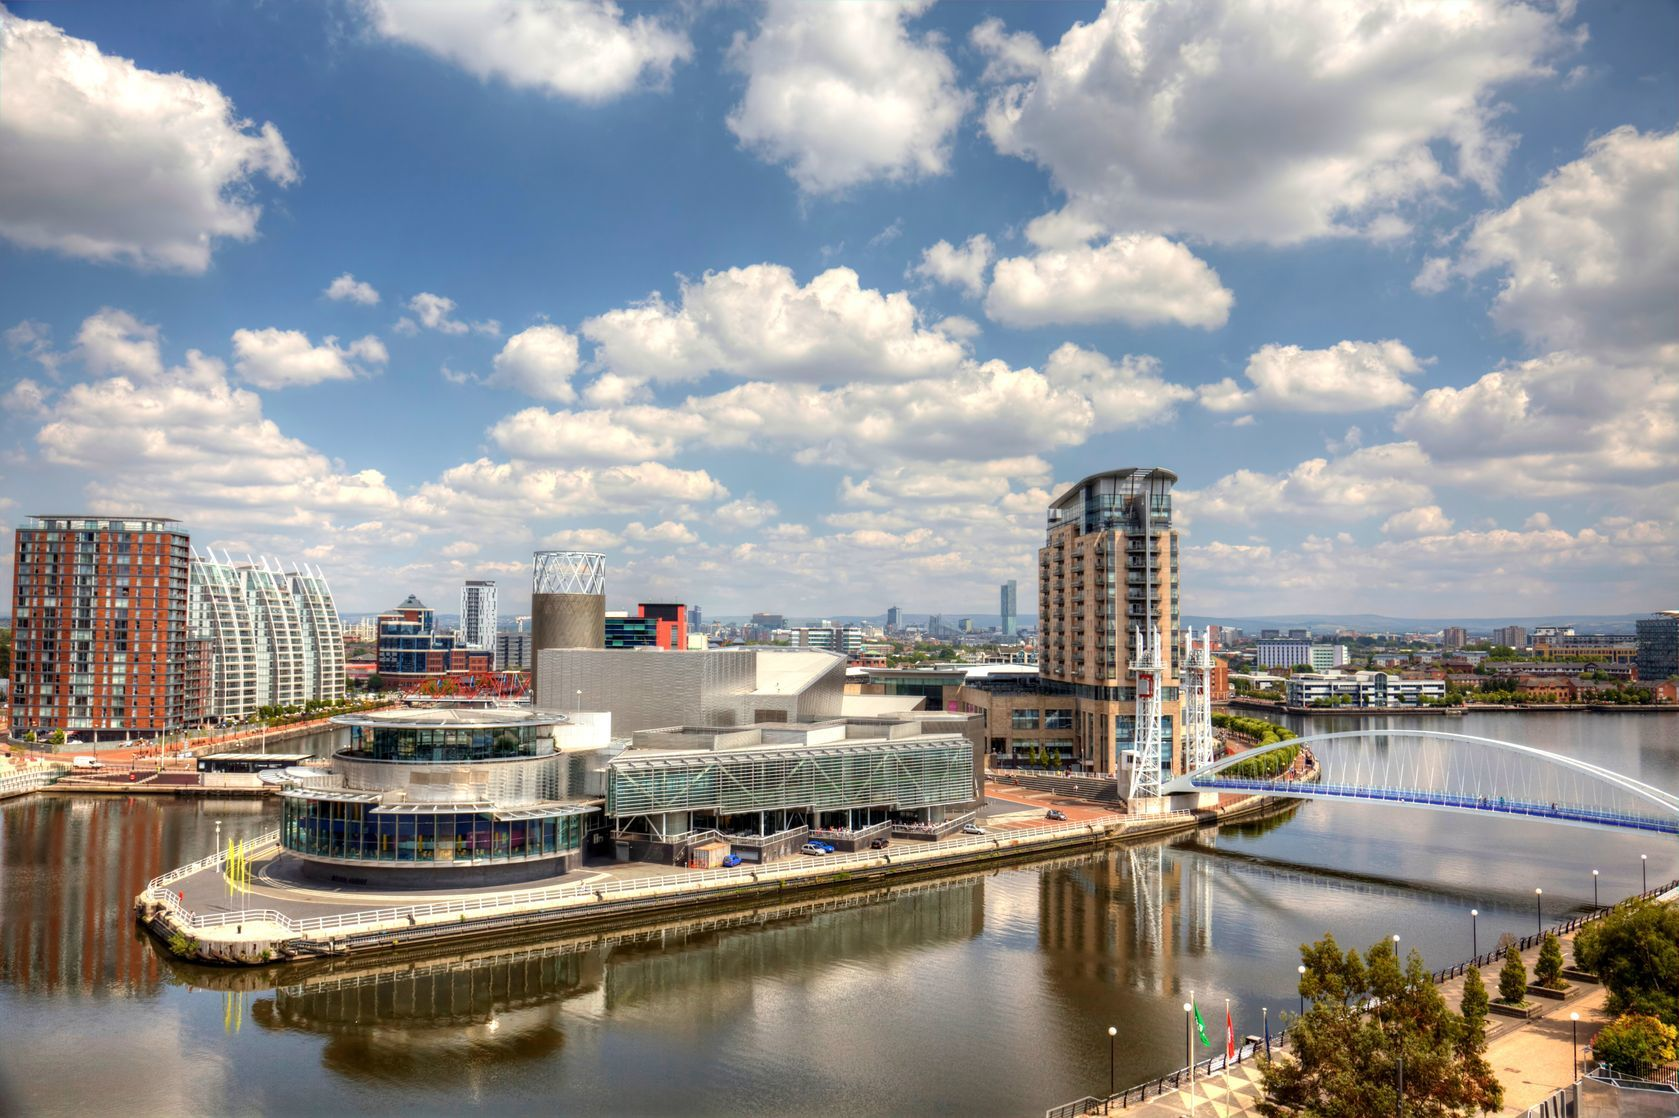 Panoramatický výhled na Manchester   debu55y/123RF.com